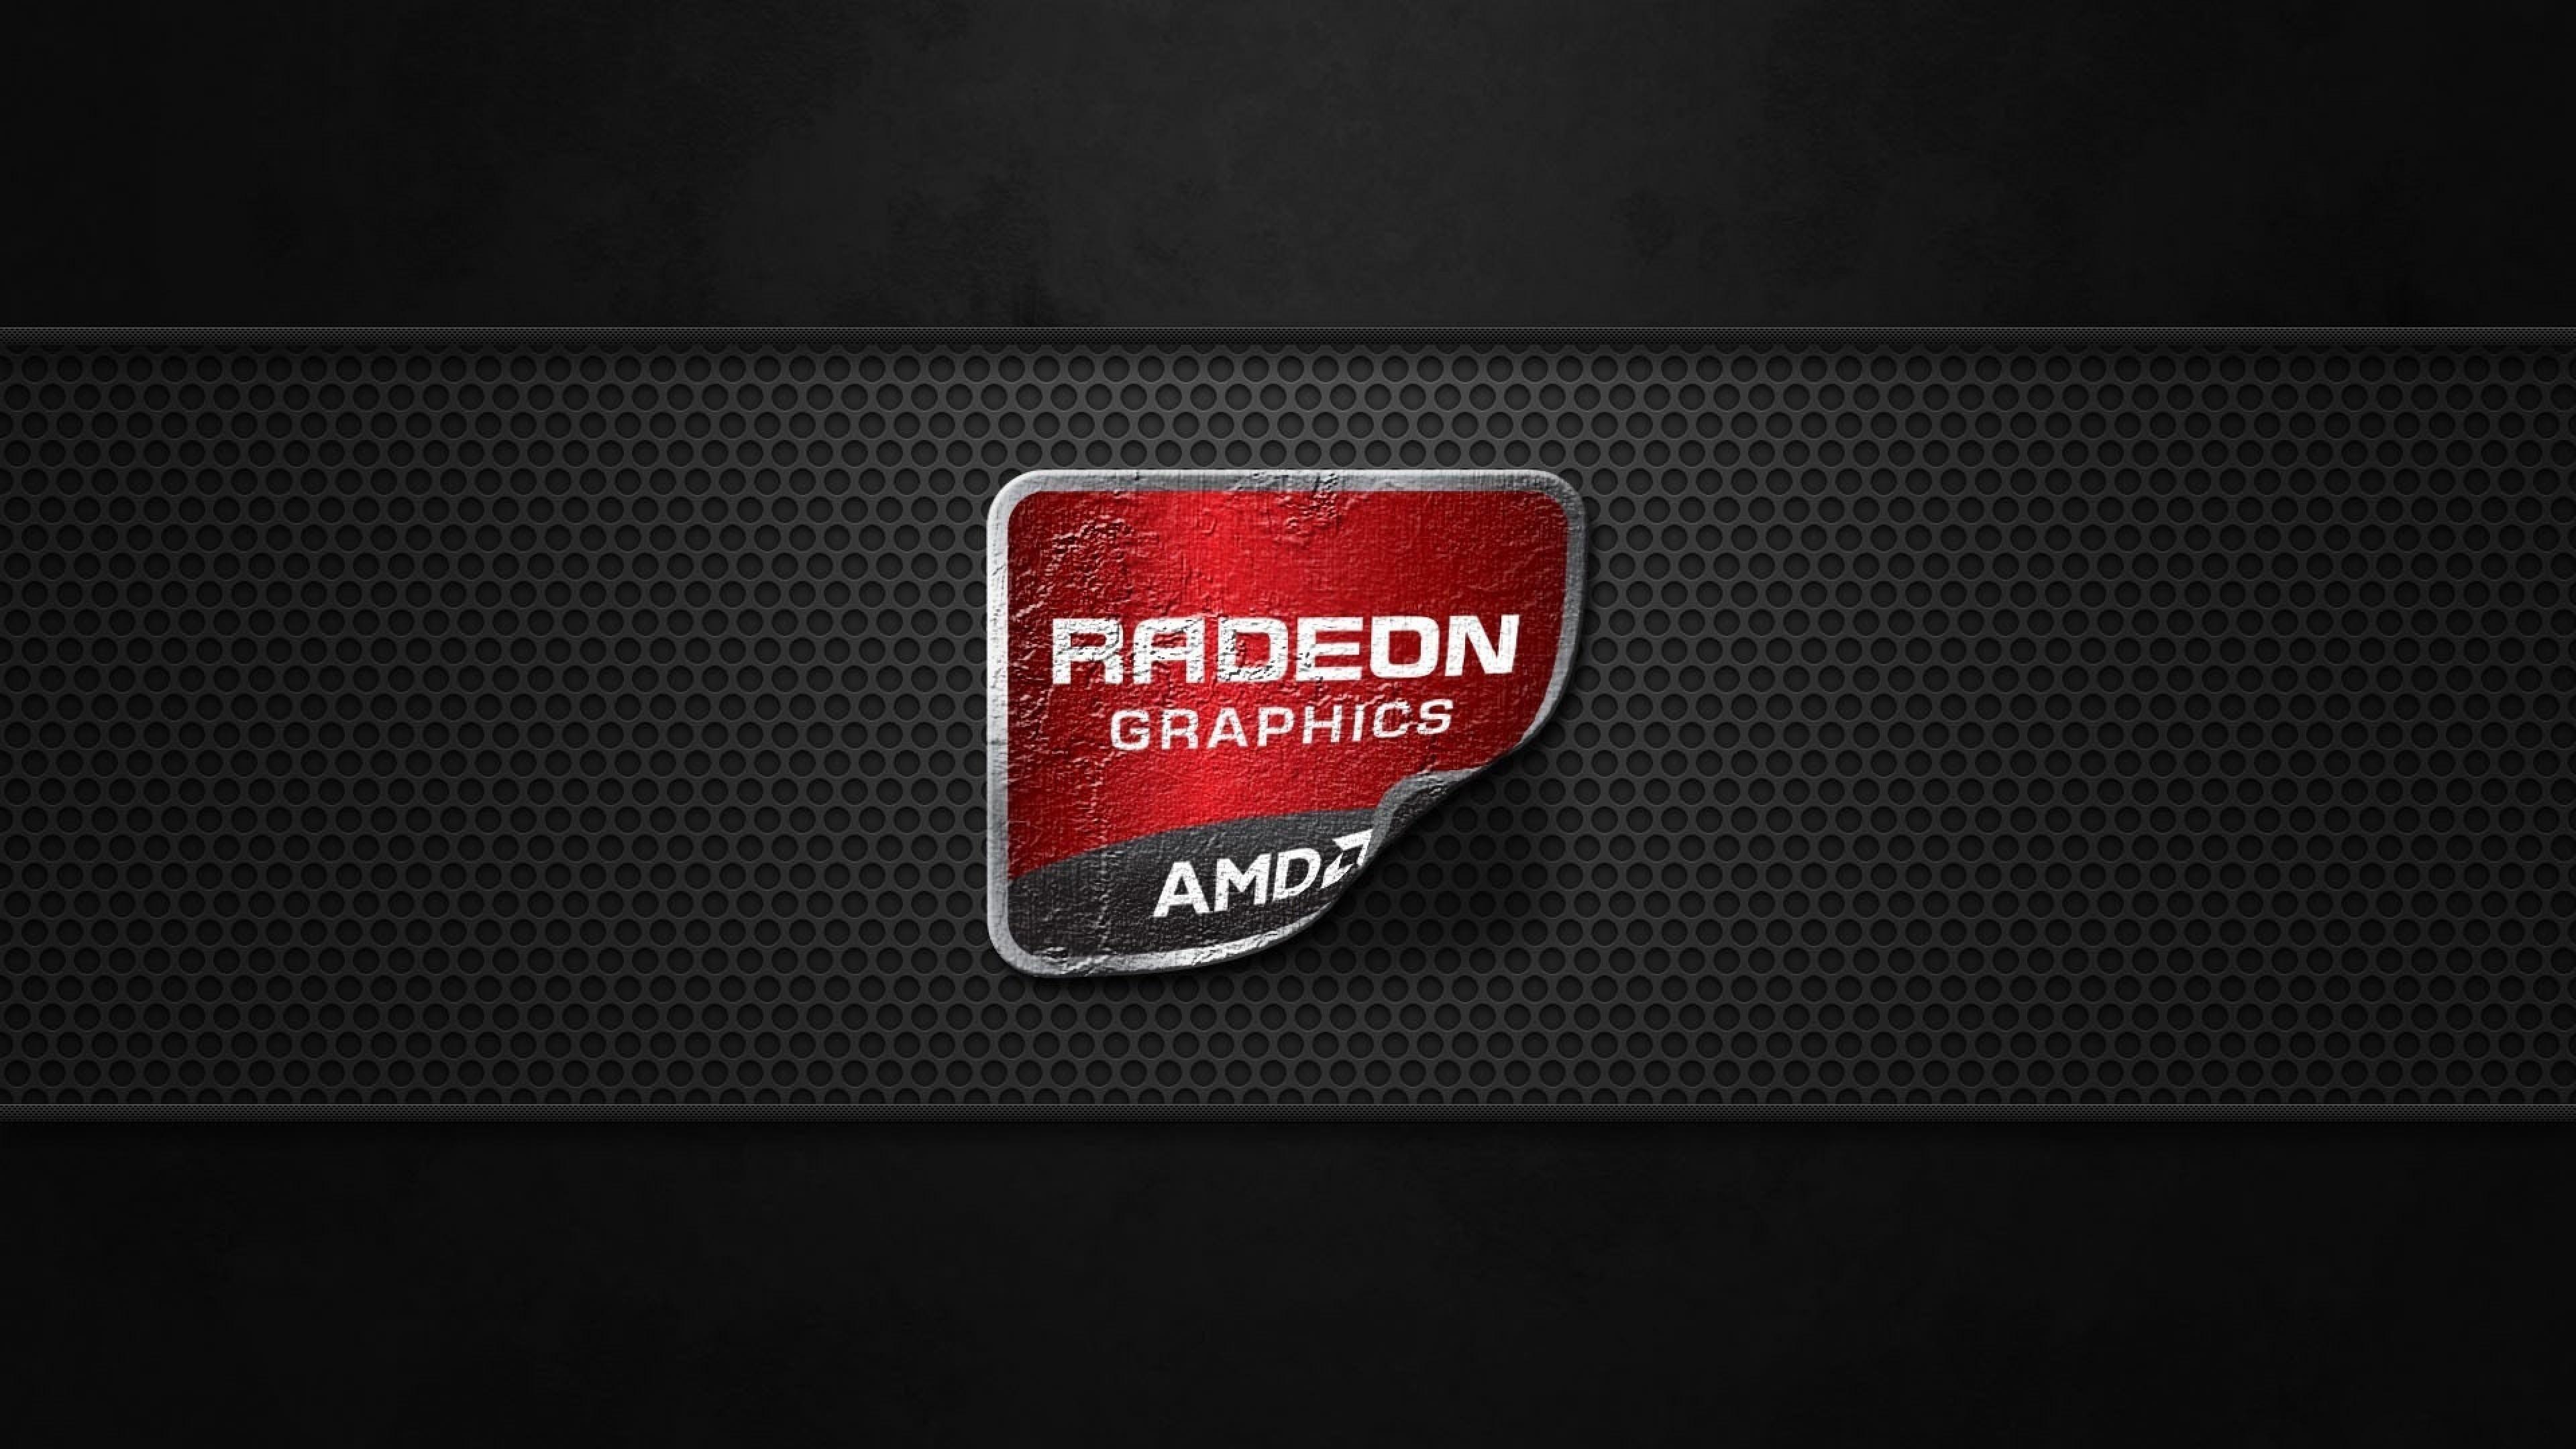 AMD Radeon Graphics HD wallpaper for 4K 3840 x 2160 – HDwallpapers.net